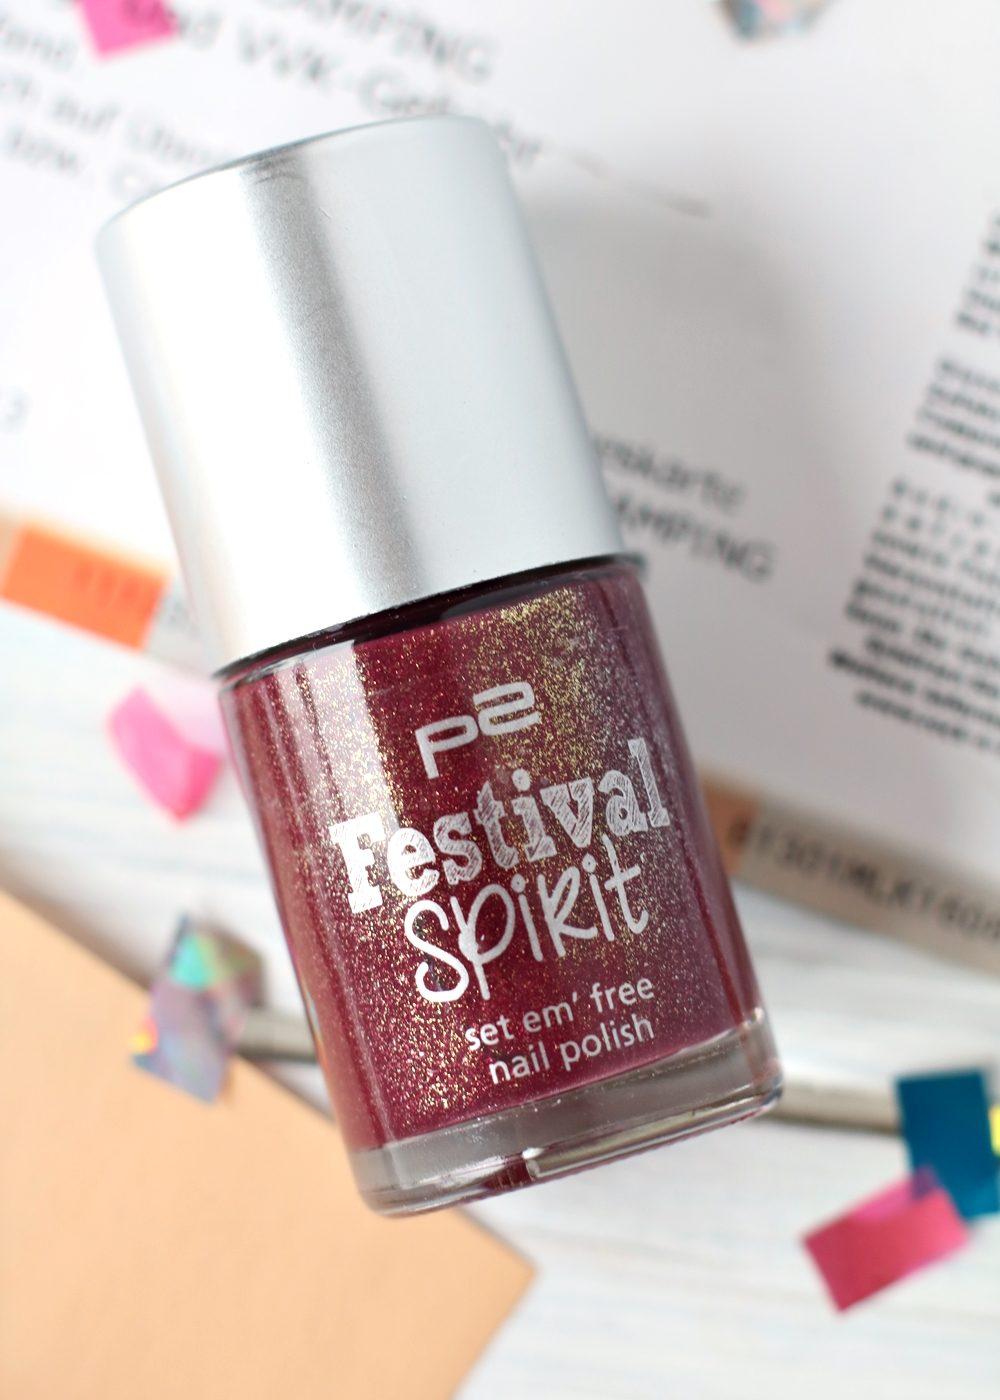 P2 Limited Edition Festival Spirit Nagellack Blush Lip Balm (5)